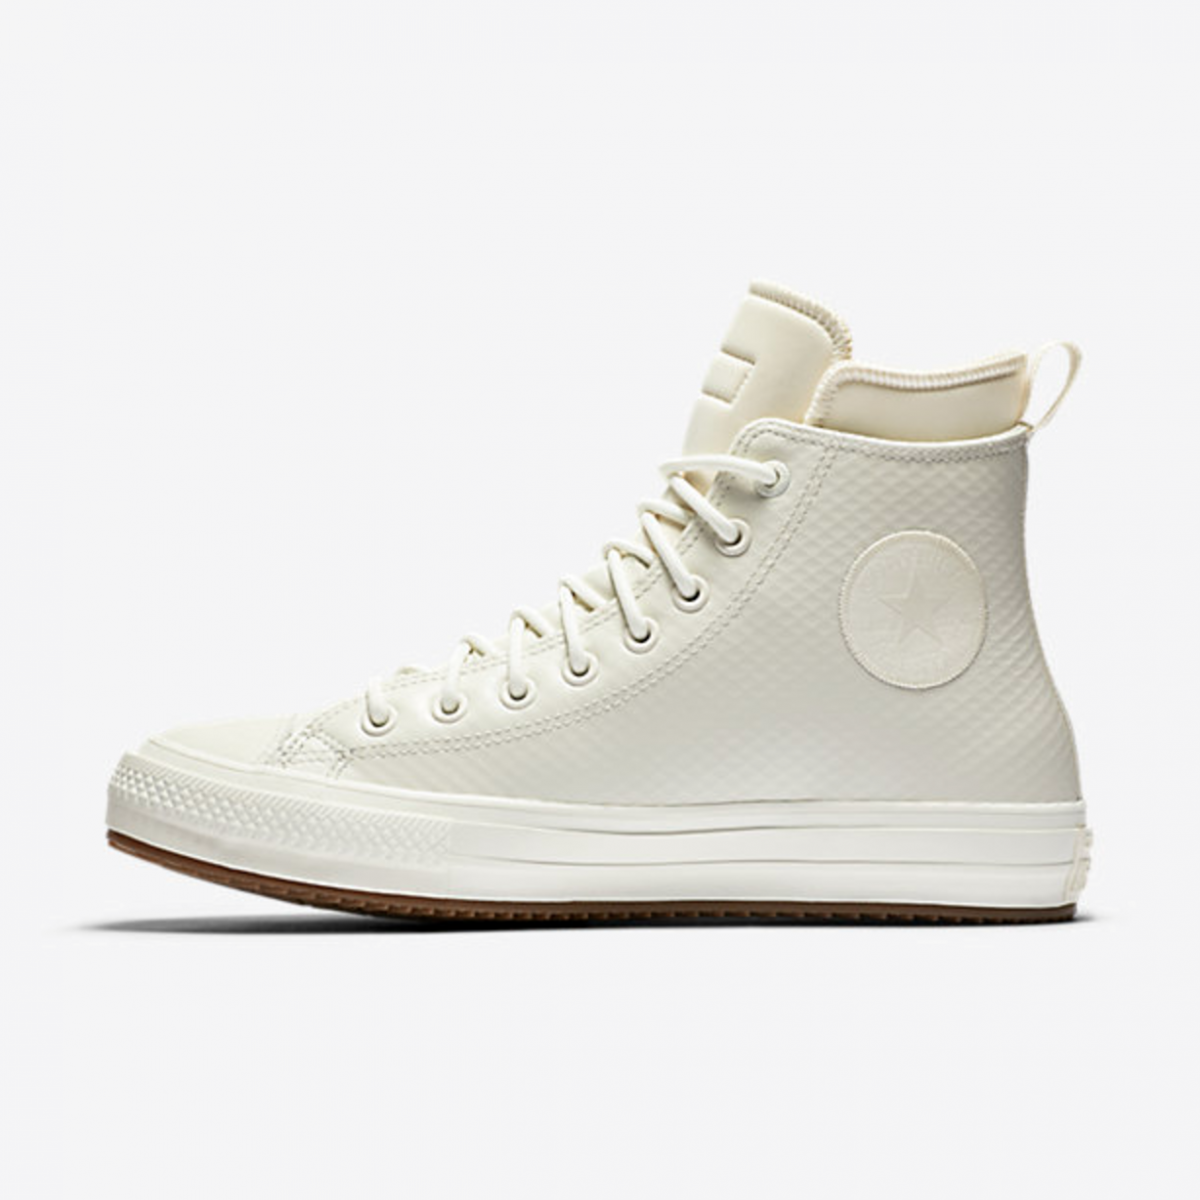 Converse Chuck II Waterproof Mesh Backed Leather Boot